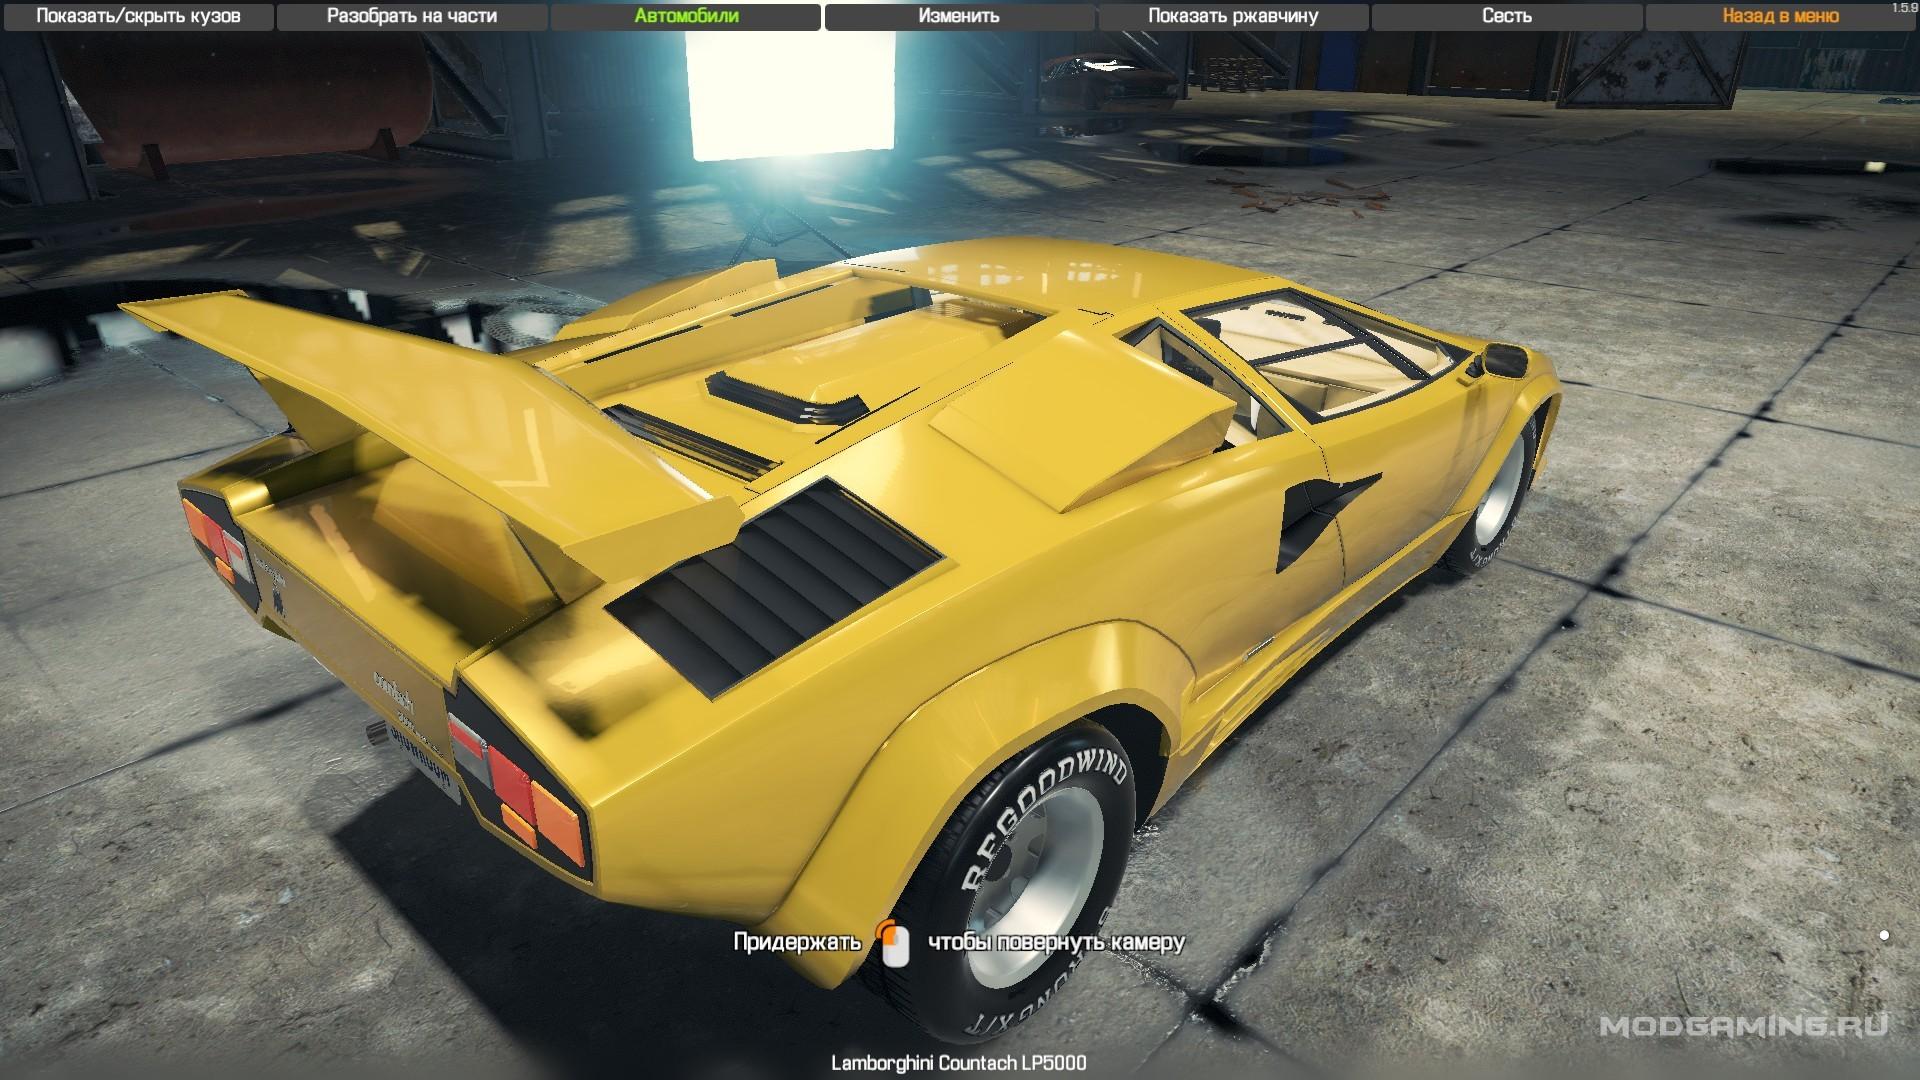 Lamborghini Countach Lp5000 для Car Mechanic Simulator 2018